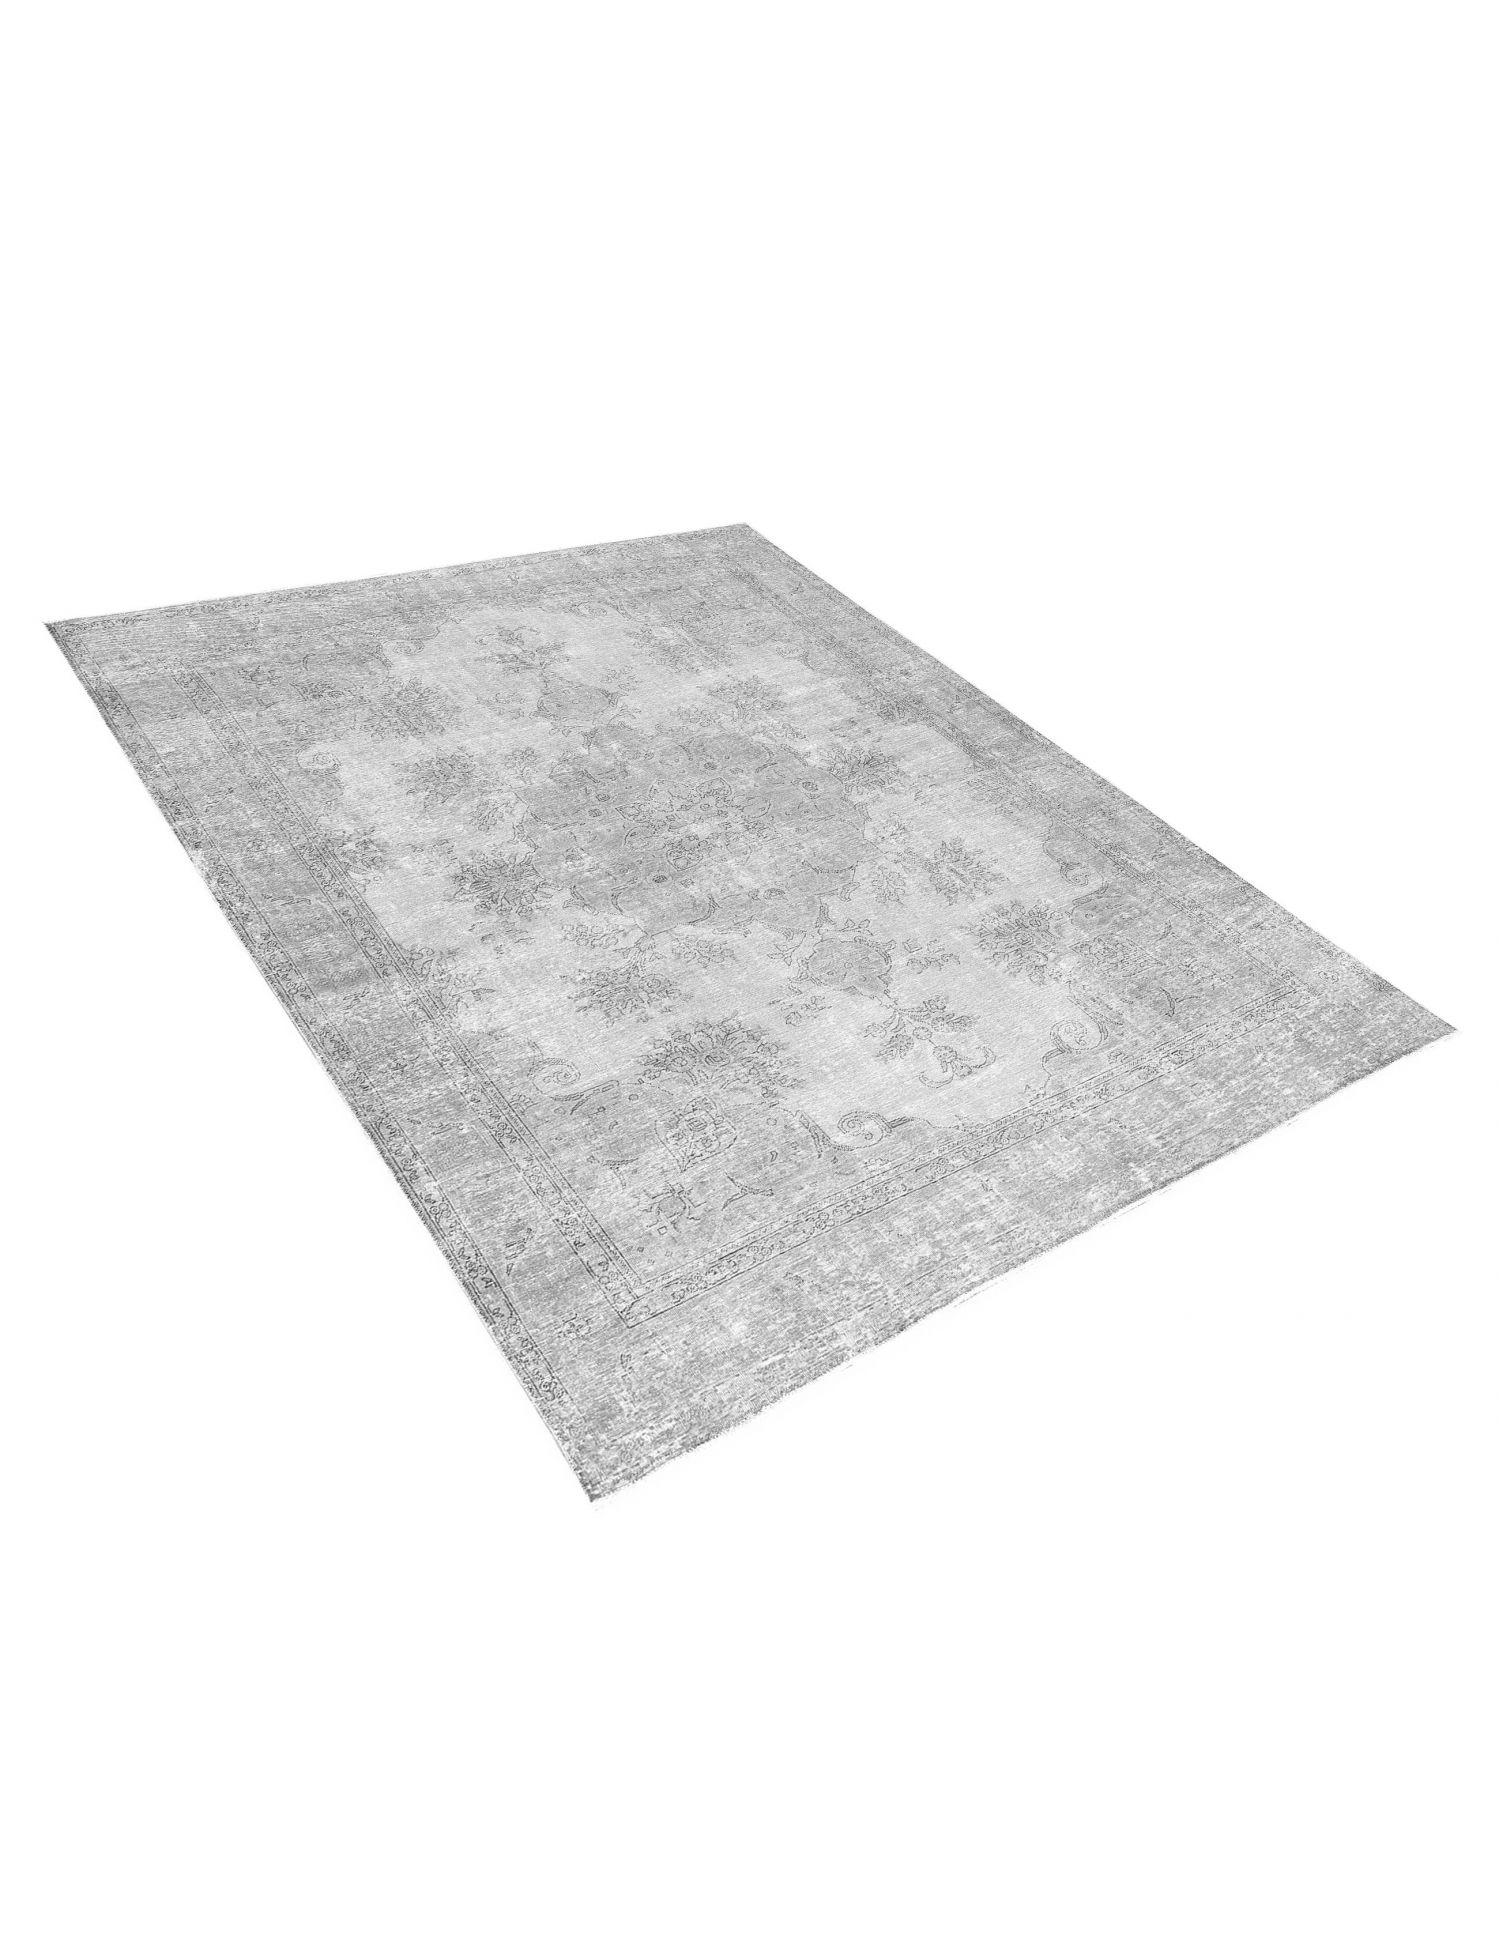 Vintage Perserteppich  grau <br/>391 x 286 cm